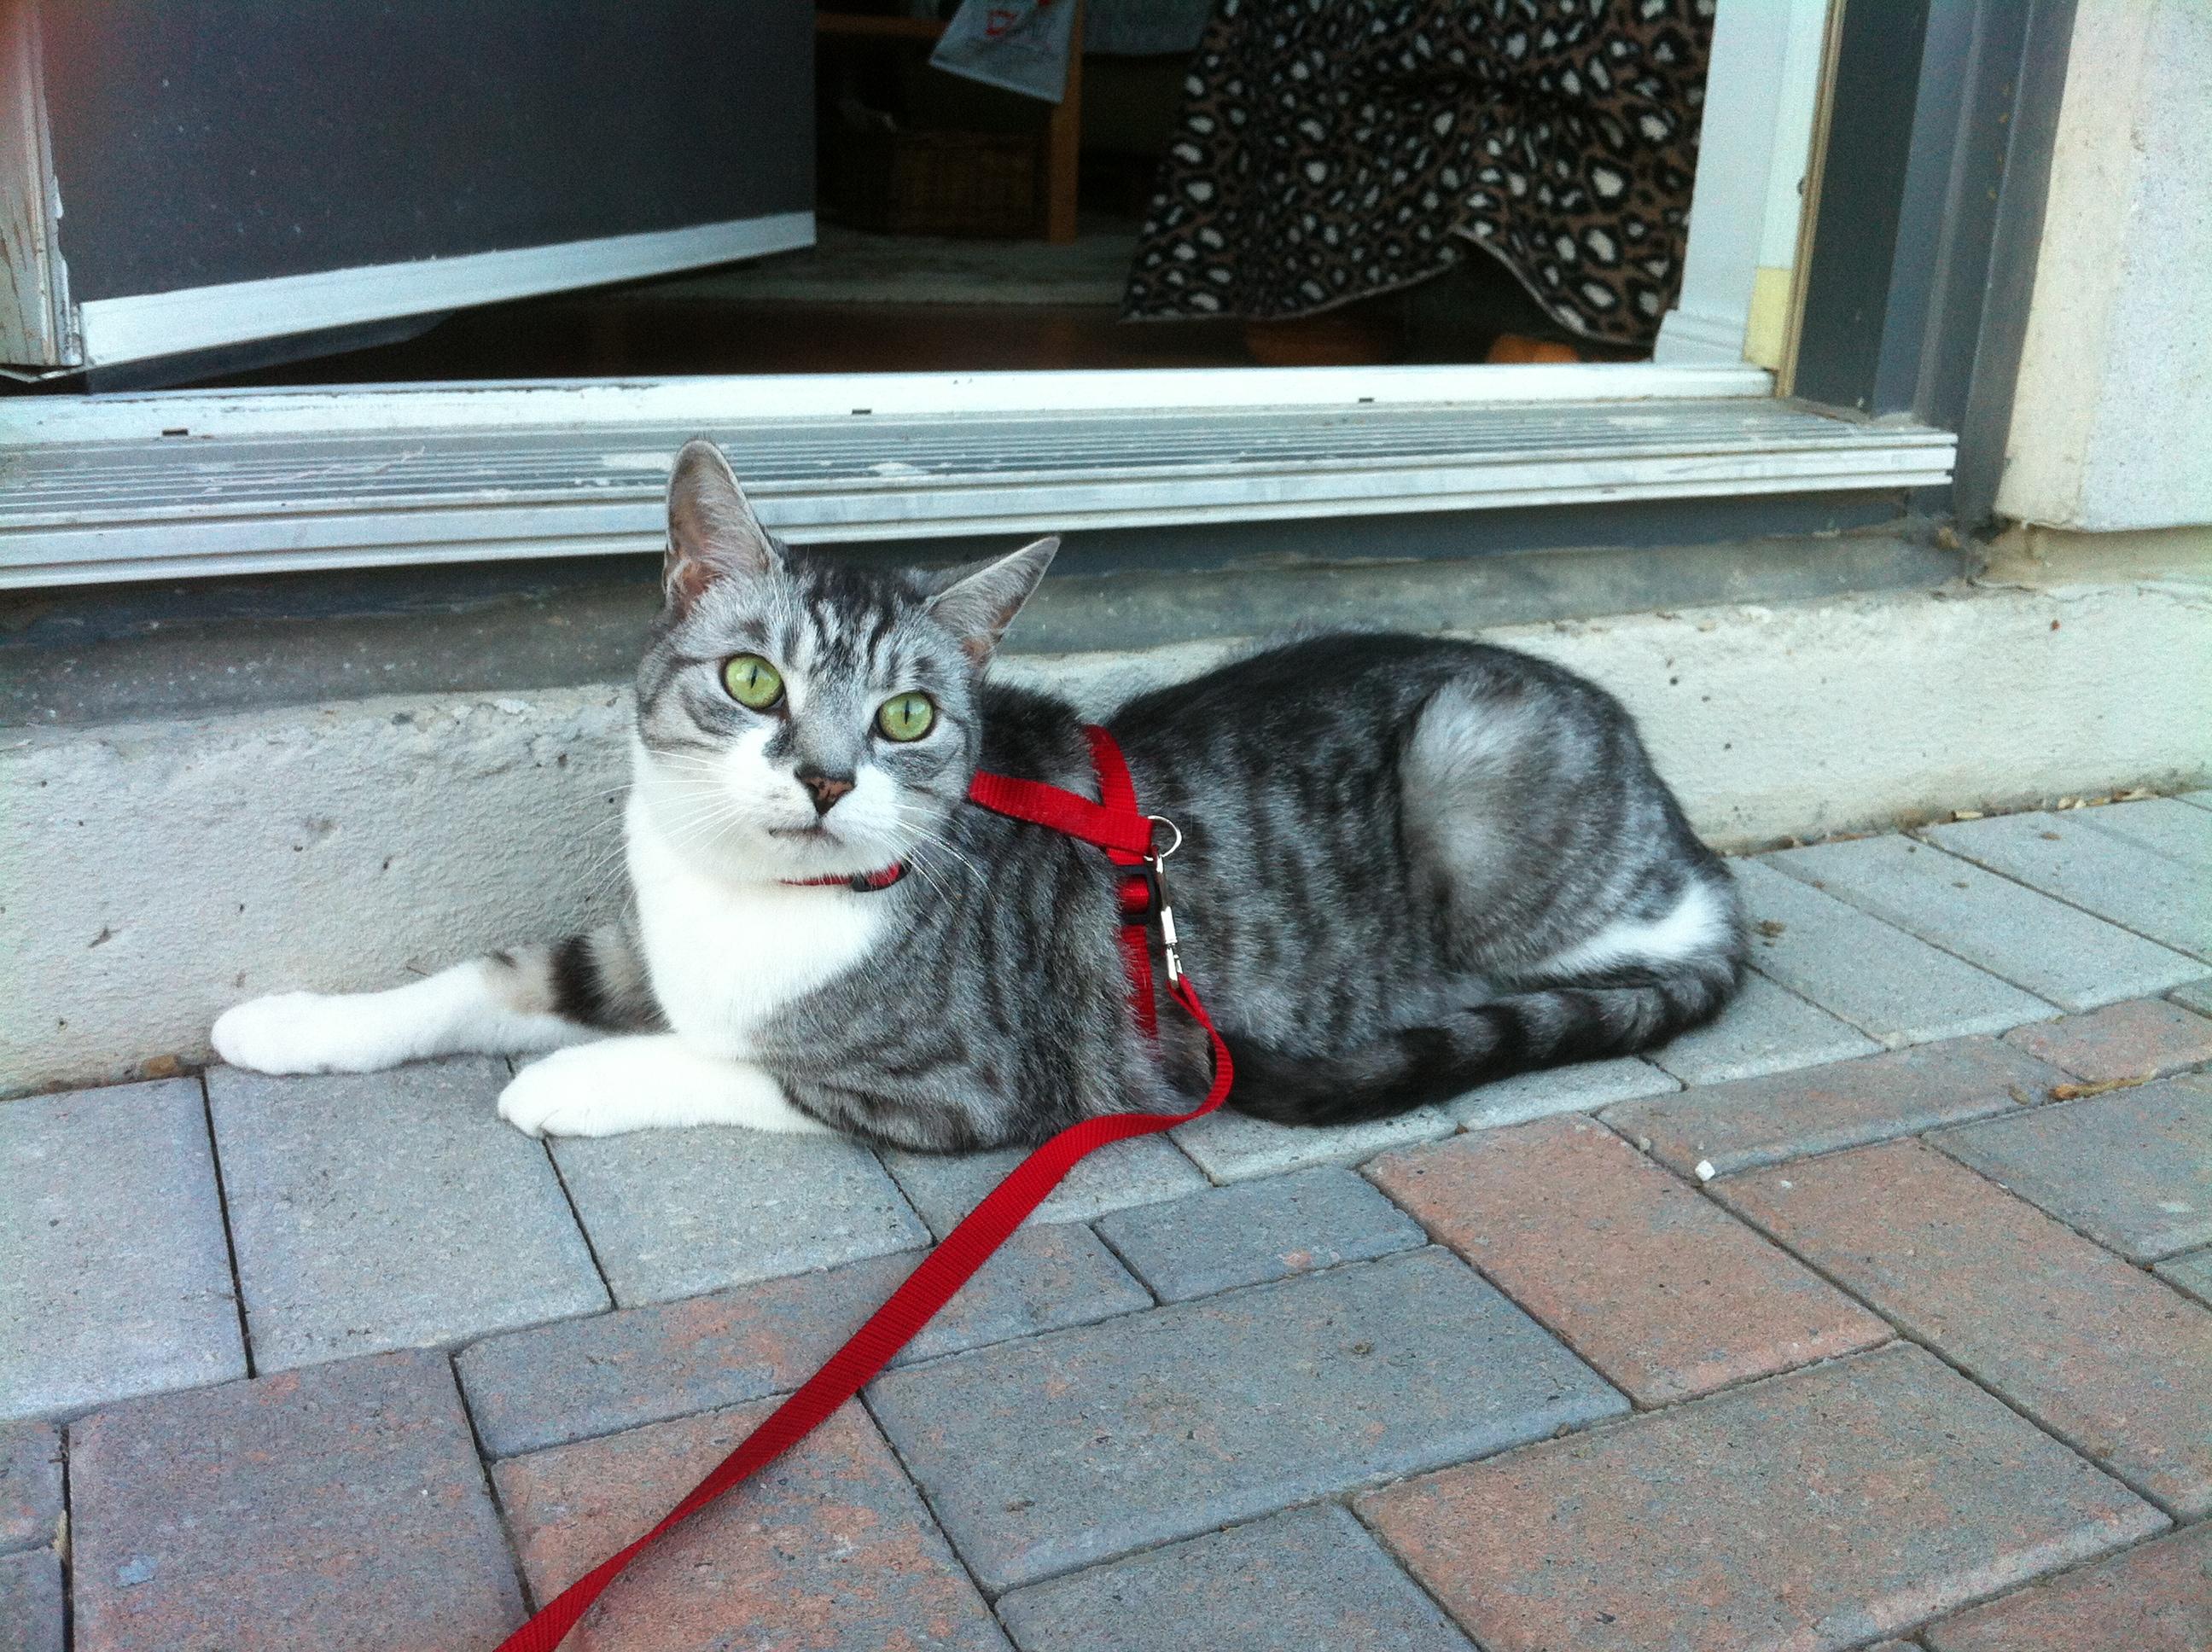 throwback thursday cat on a leash. Black Bedroom Furniture Sets. Home Design Ideas